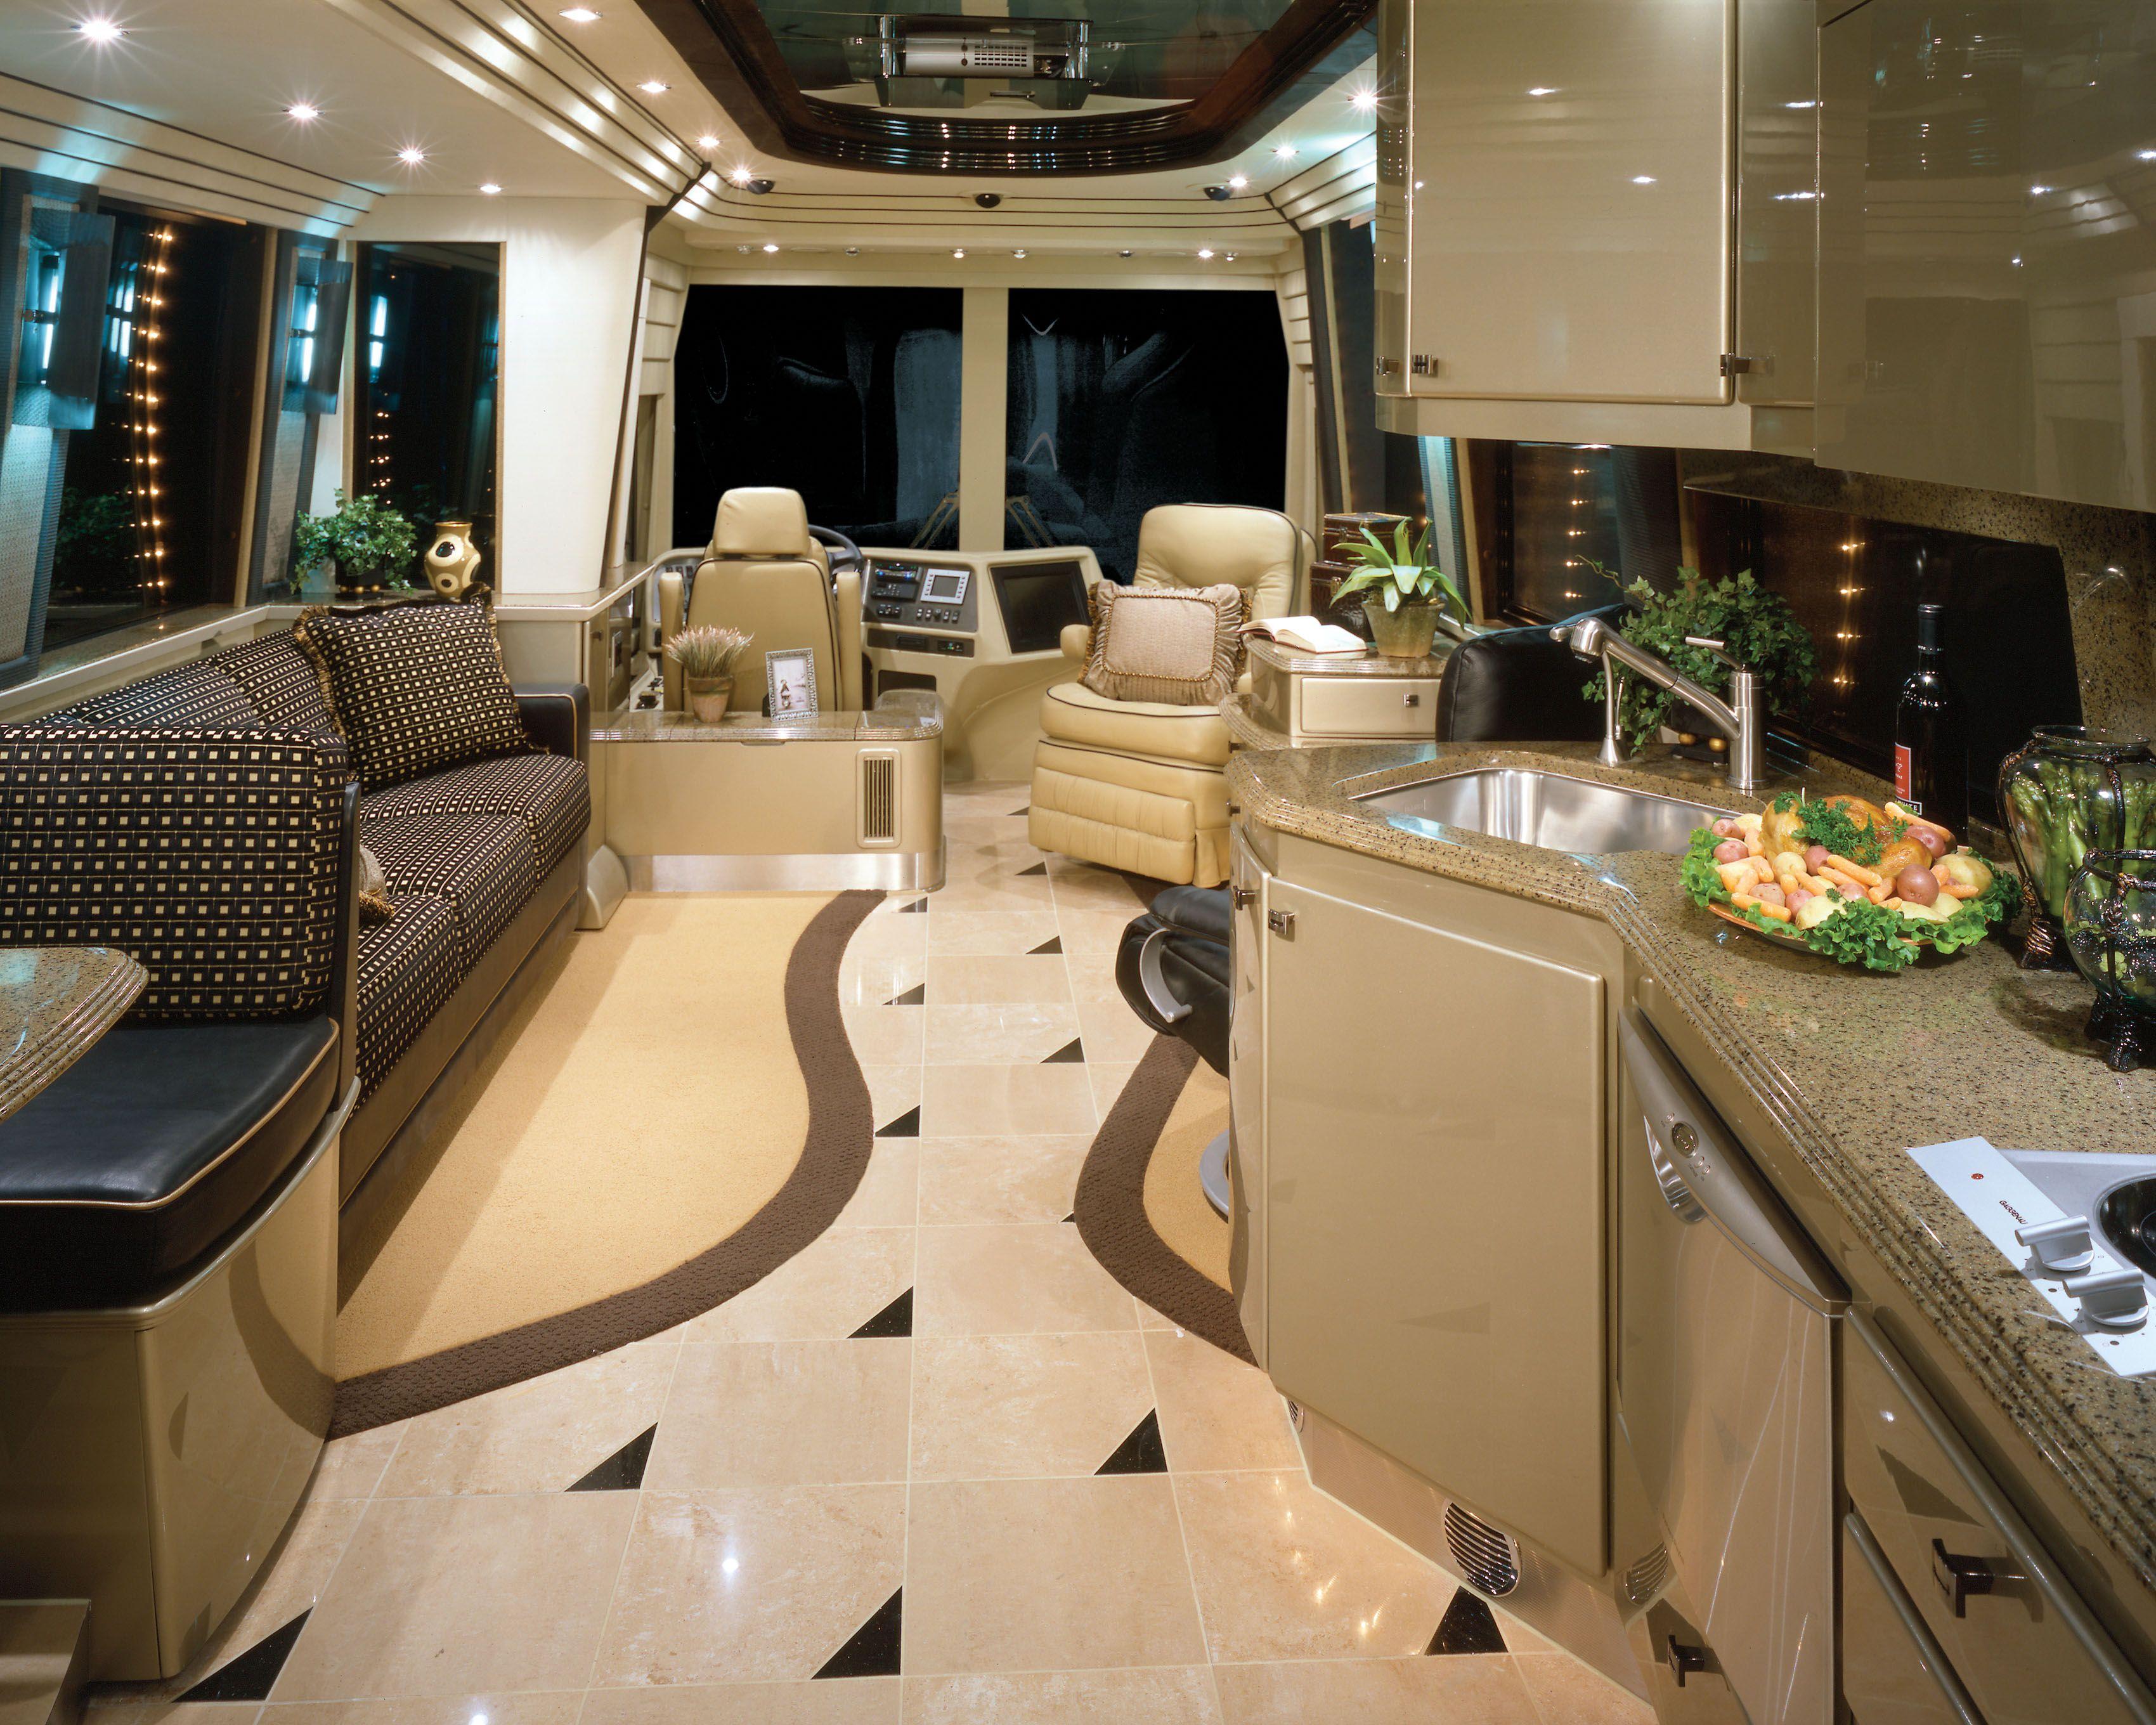 Pin By Jarrett Williams On Favorite Places Spaces Luxury Rv Rv Interior Design Motorhome Interior